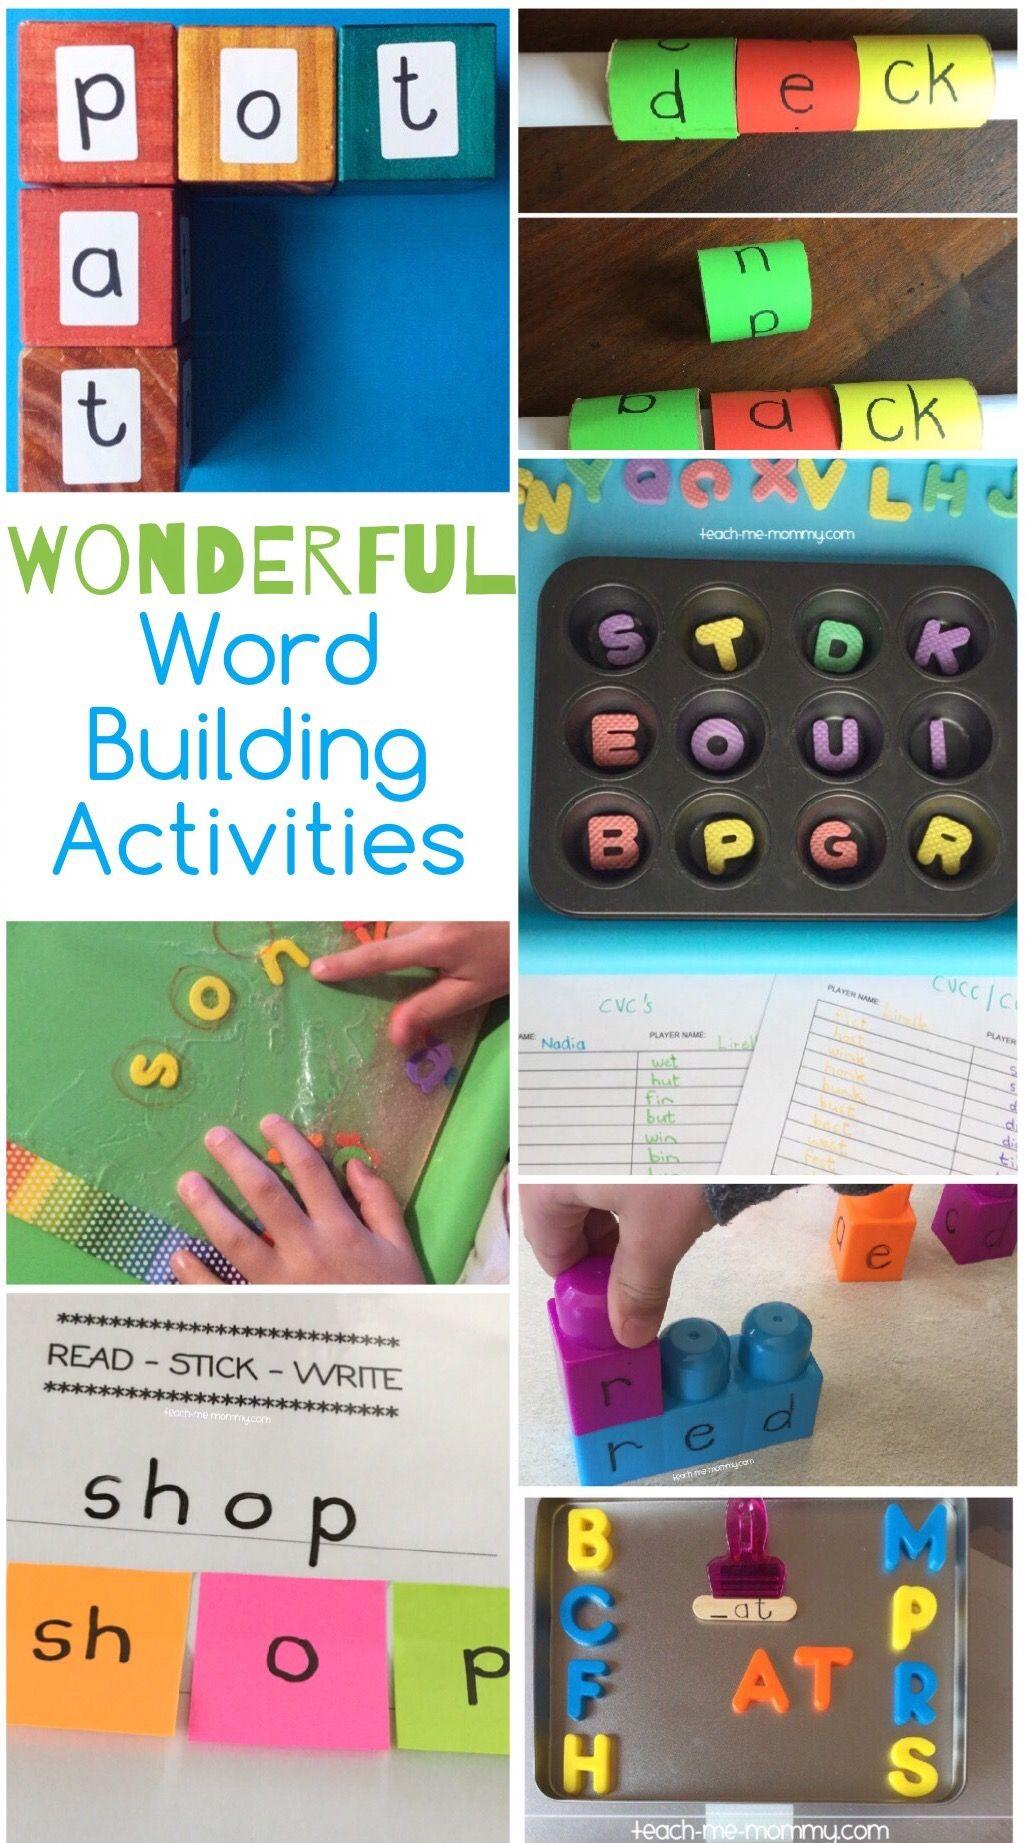 Wonderful Word Building Ideas